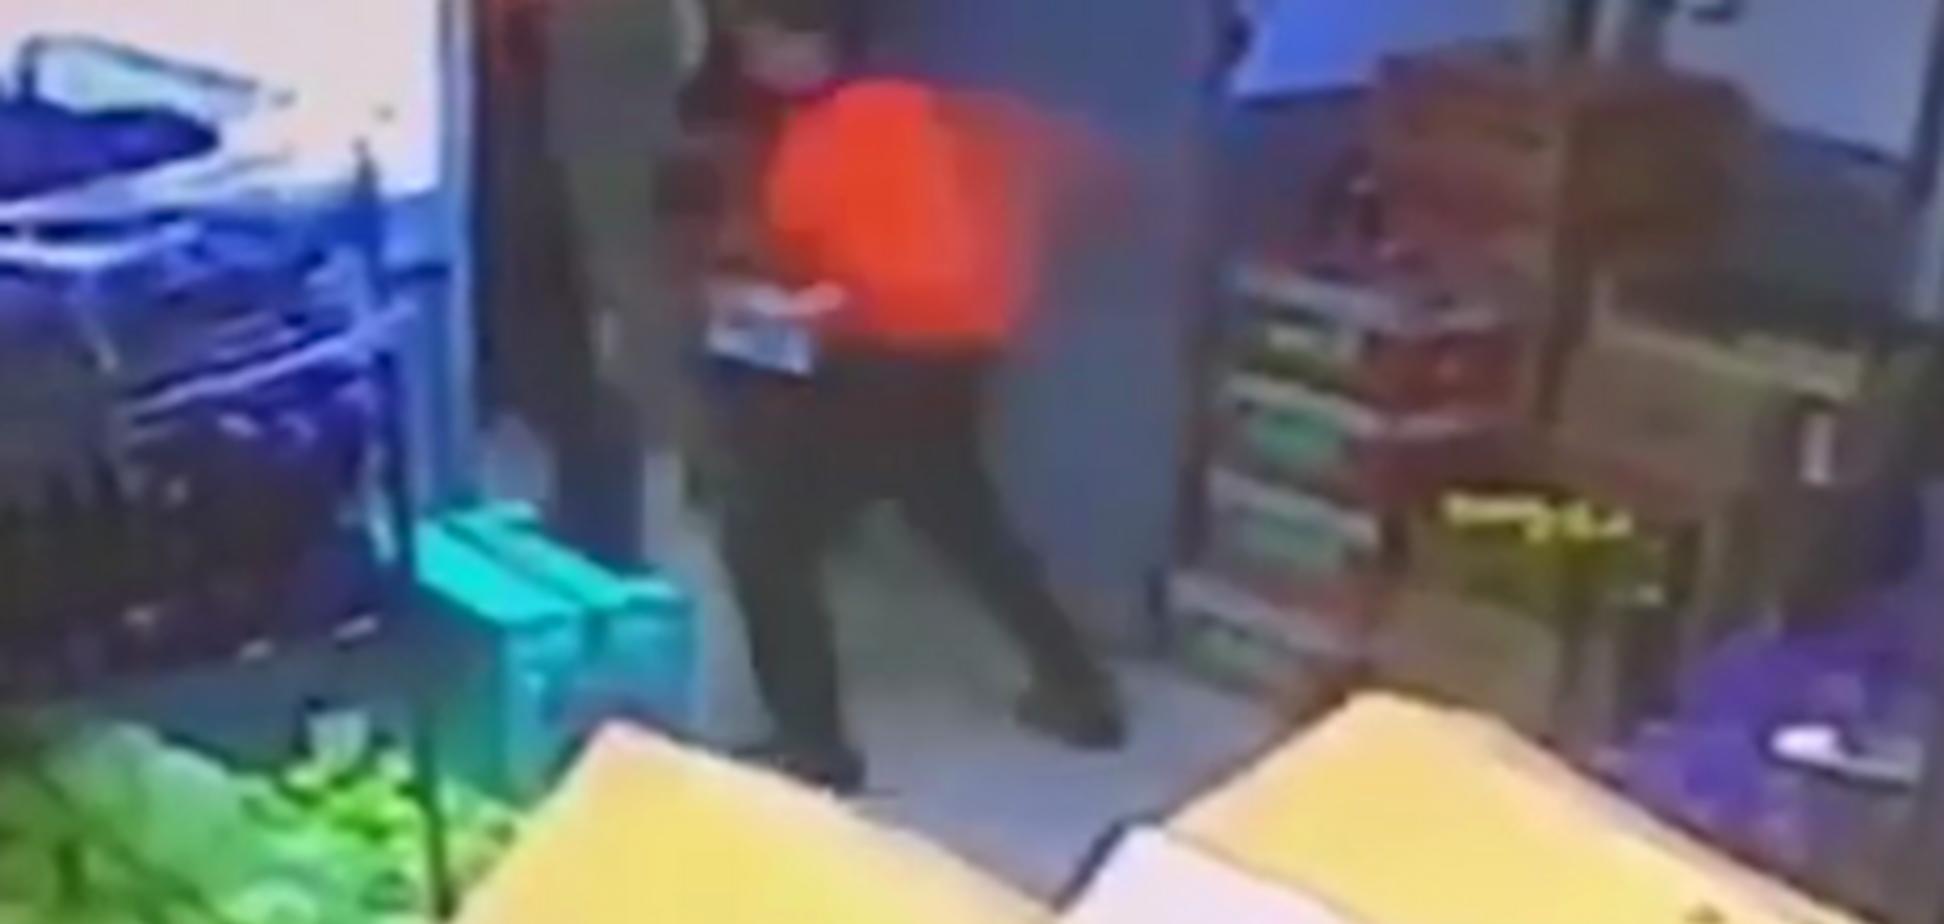 В Москве кассир одним ударом убил клиента за банку кофе: видеофакт